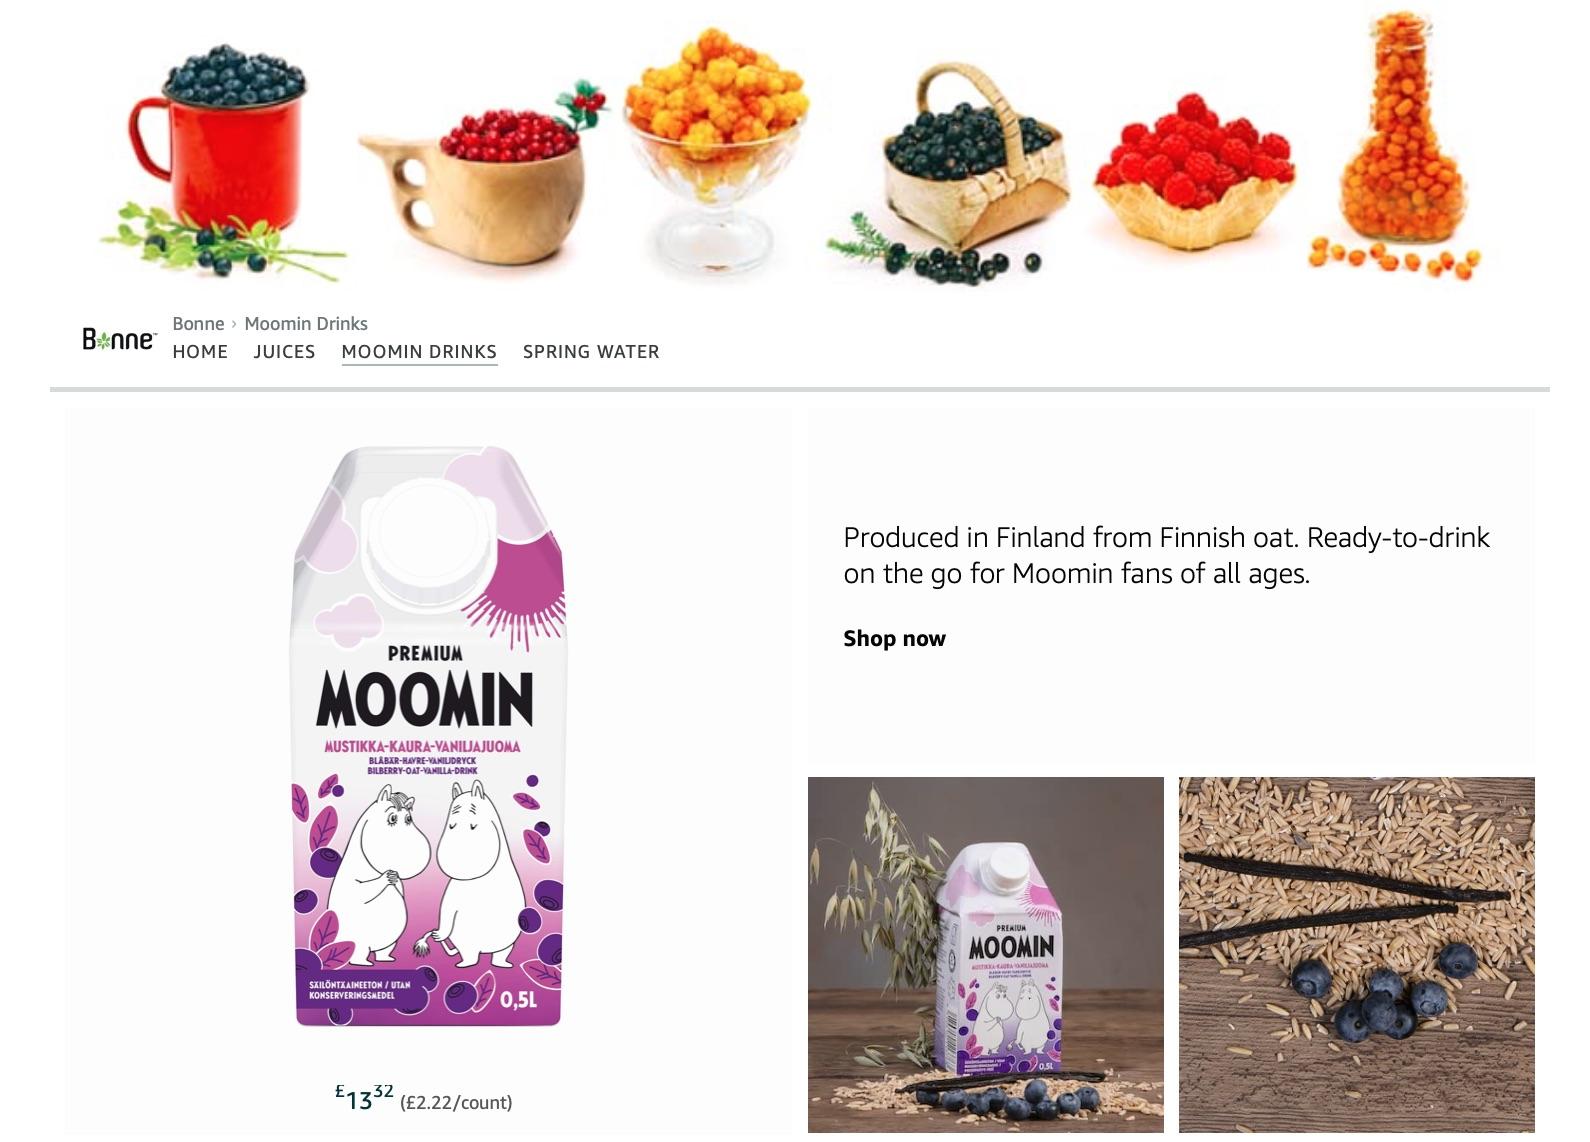 Moonin oat drink and berries